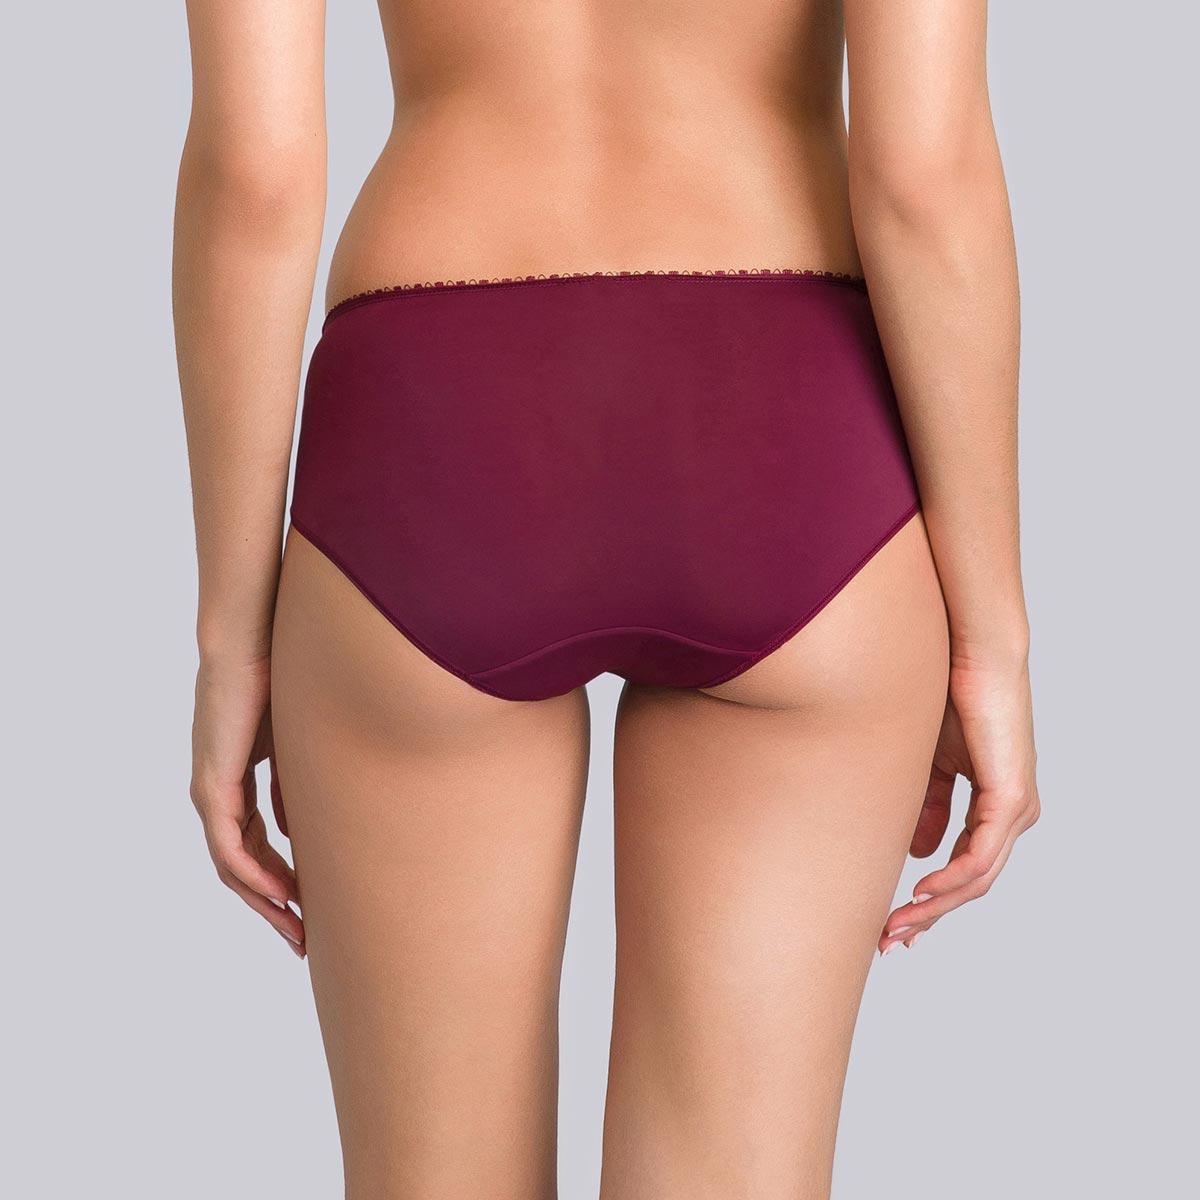 Culotte Midi violette bordeaux - Flower Elegance-PLAYTEX